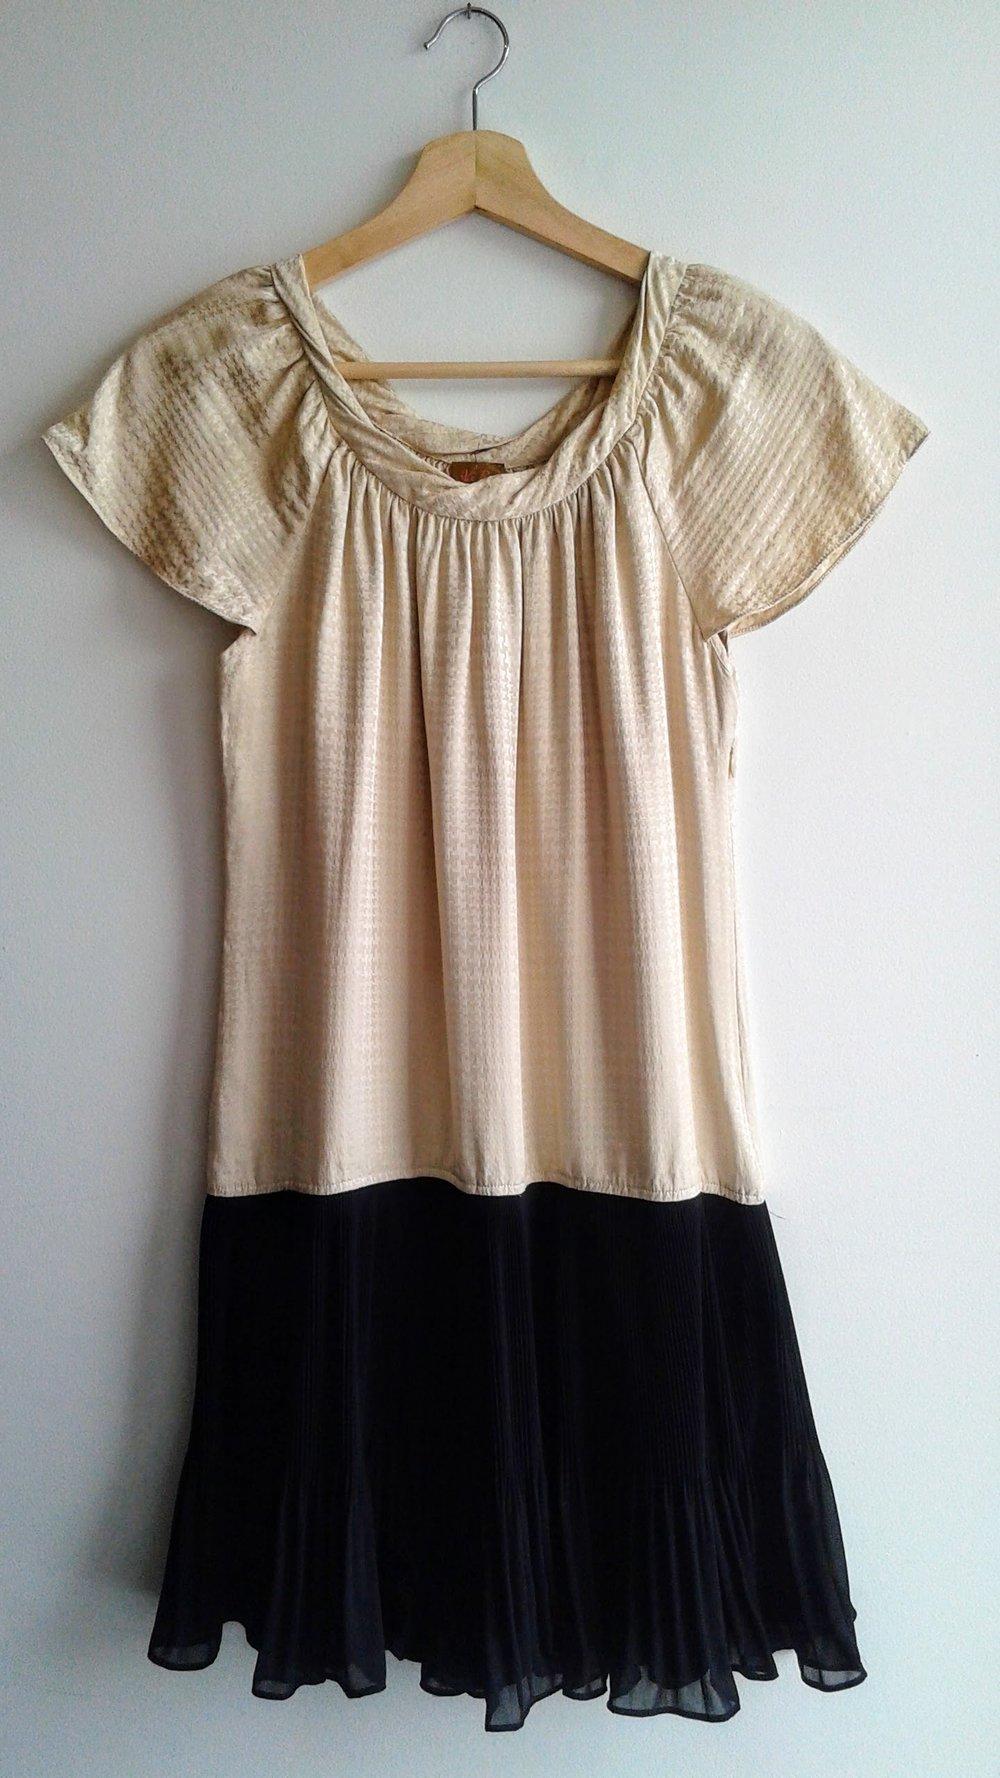 Ali Ro dress; Size 4, $30